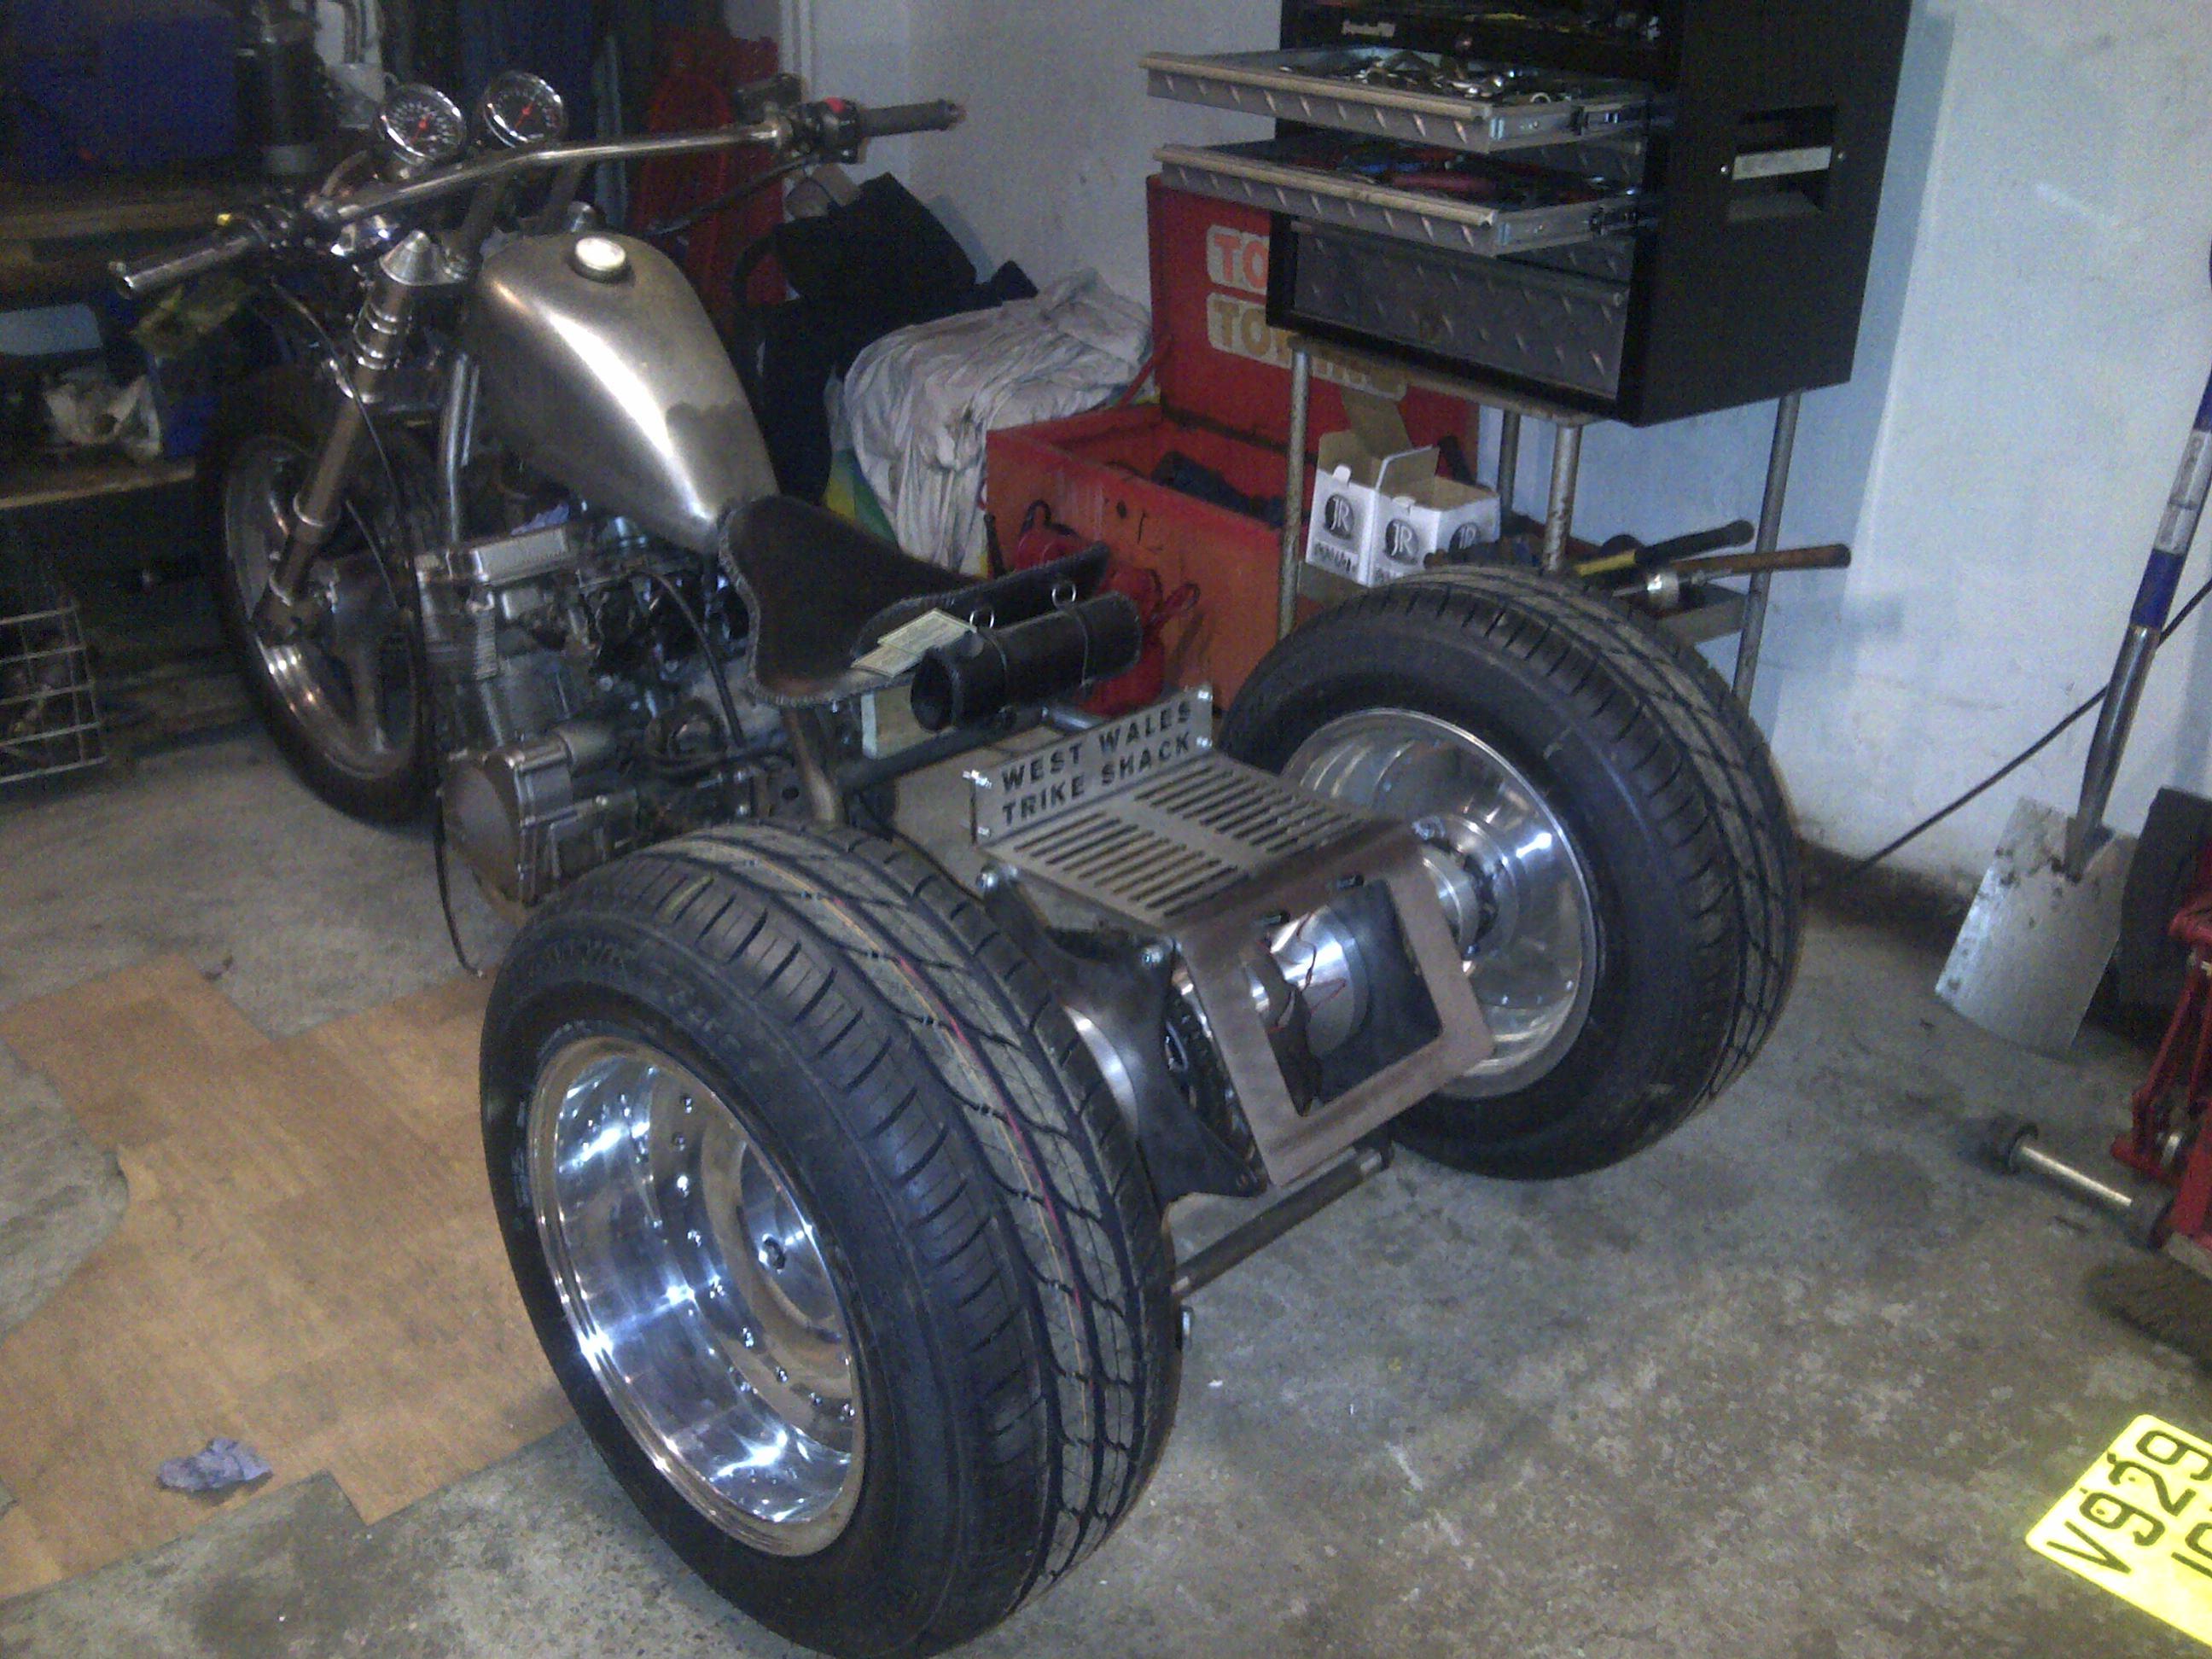 West Wales Trike Shack